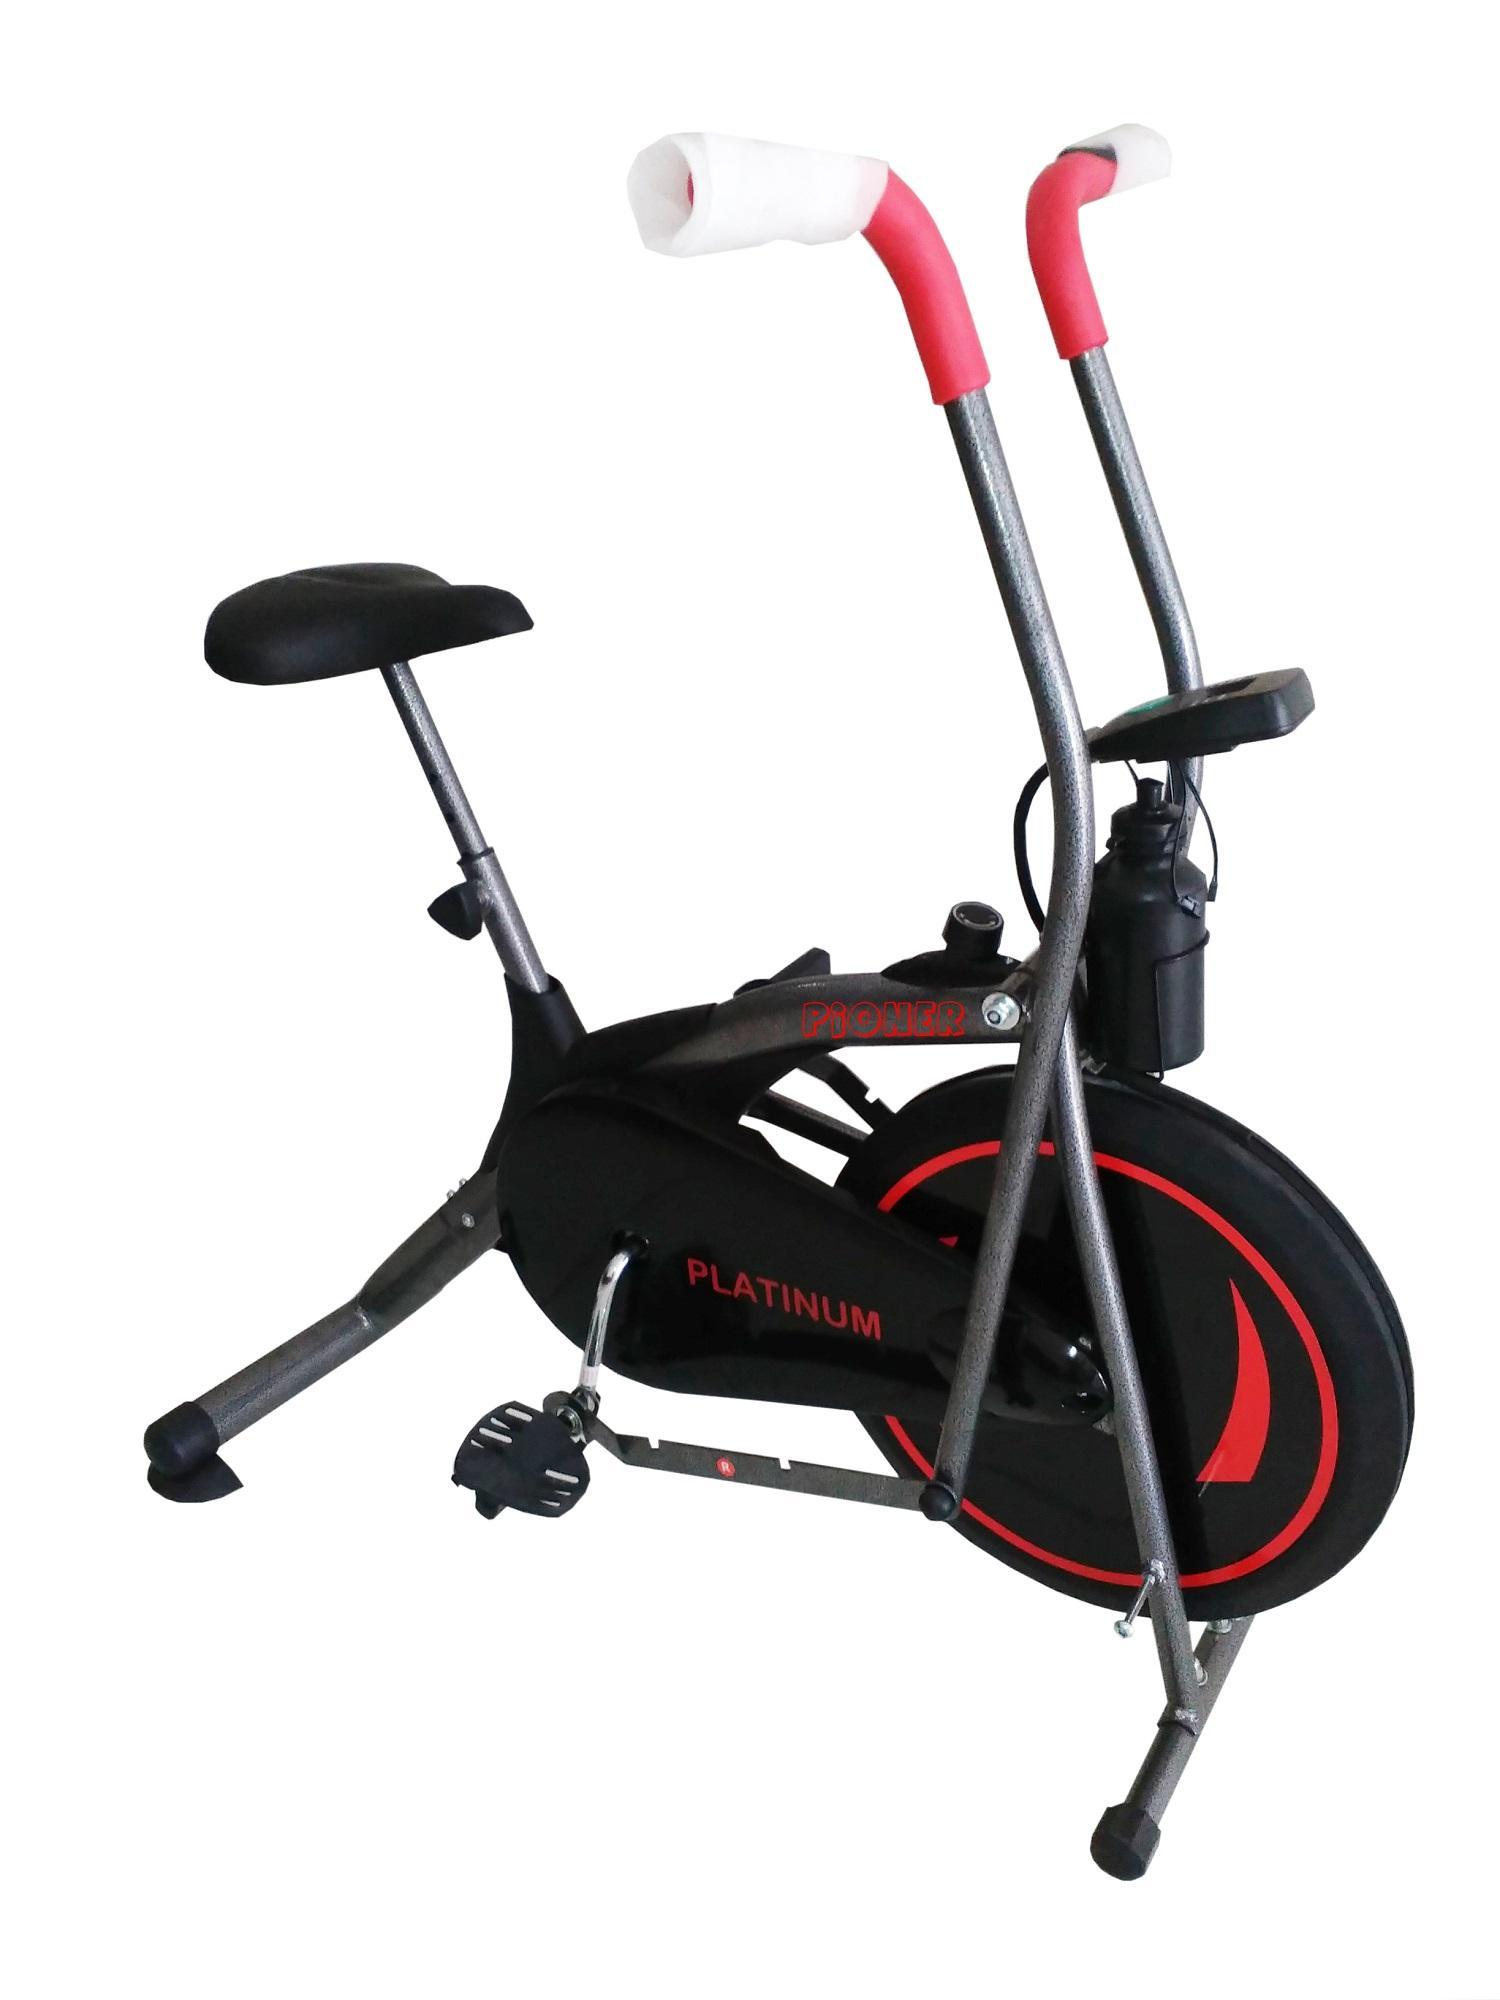 FREE ONGKIR JABODETABEK- Sepeda Statis Platinum Bike 2in1 - Sepeda Fitnes,Olahraga,- Harga Murah - Best Seller Product